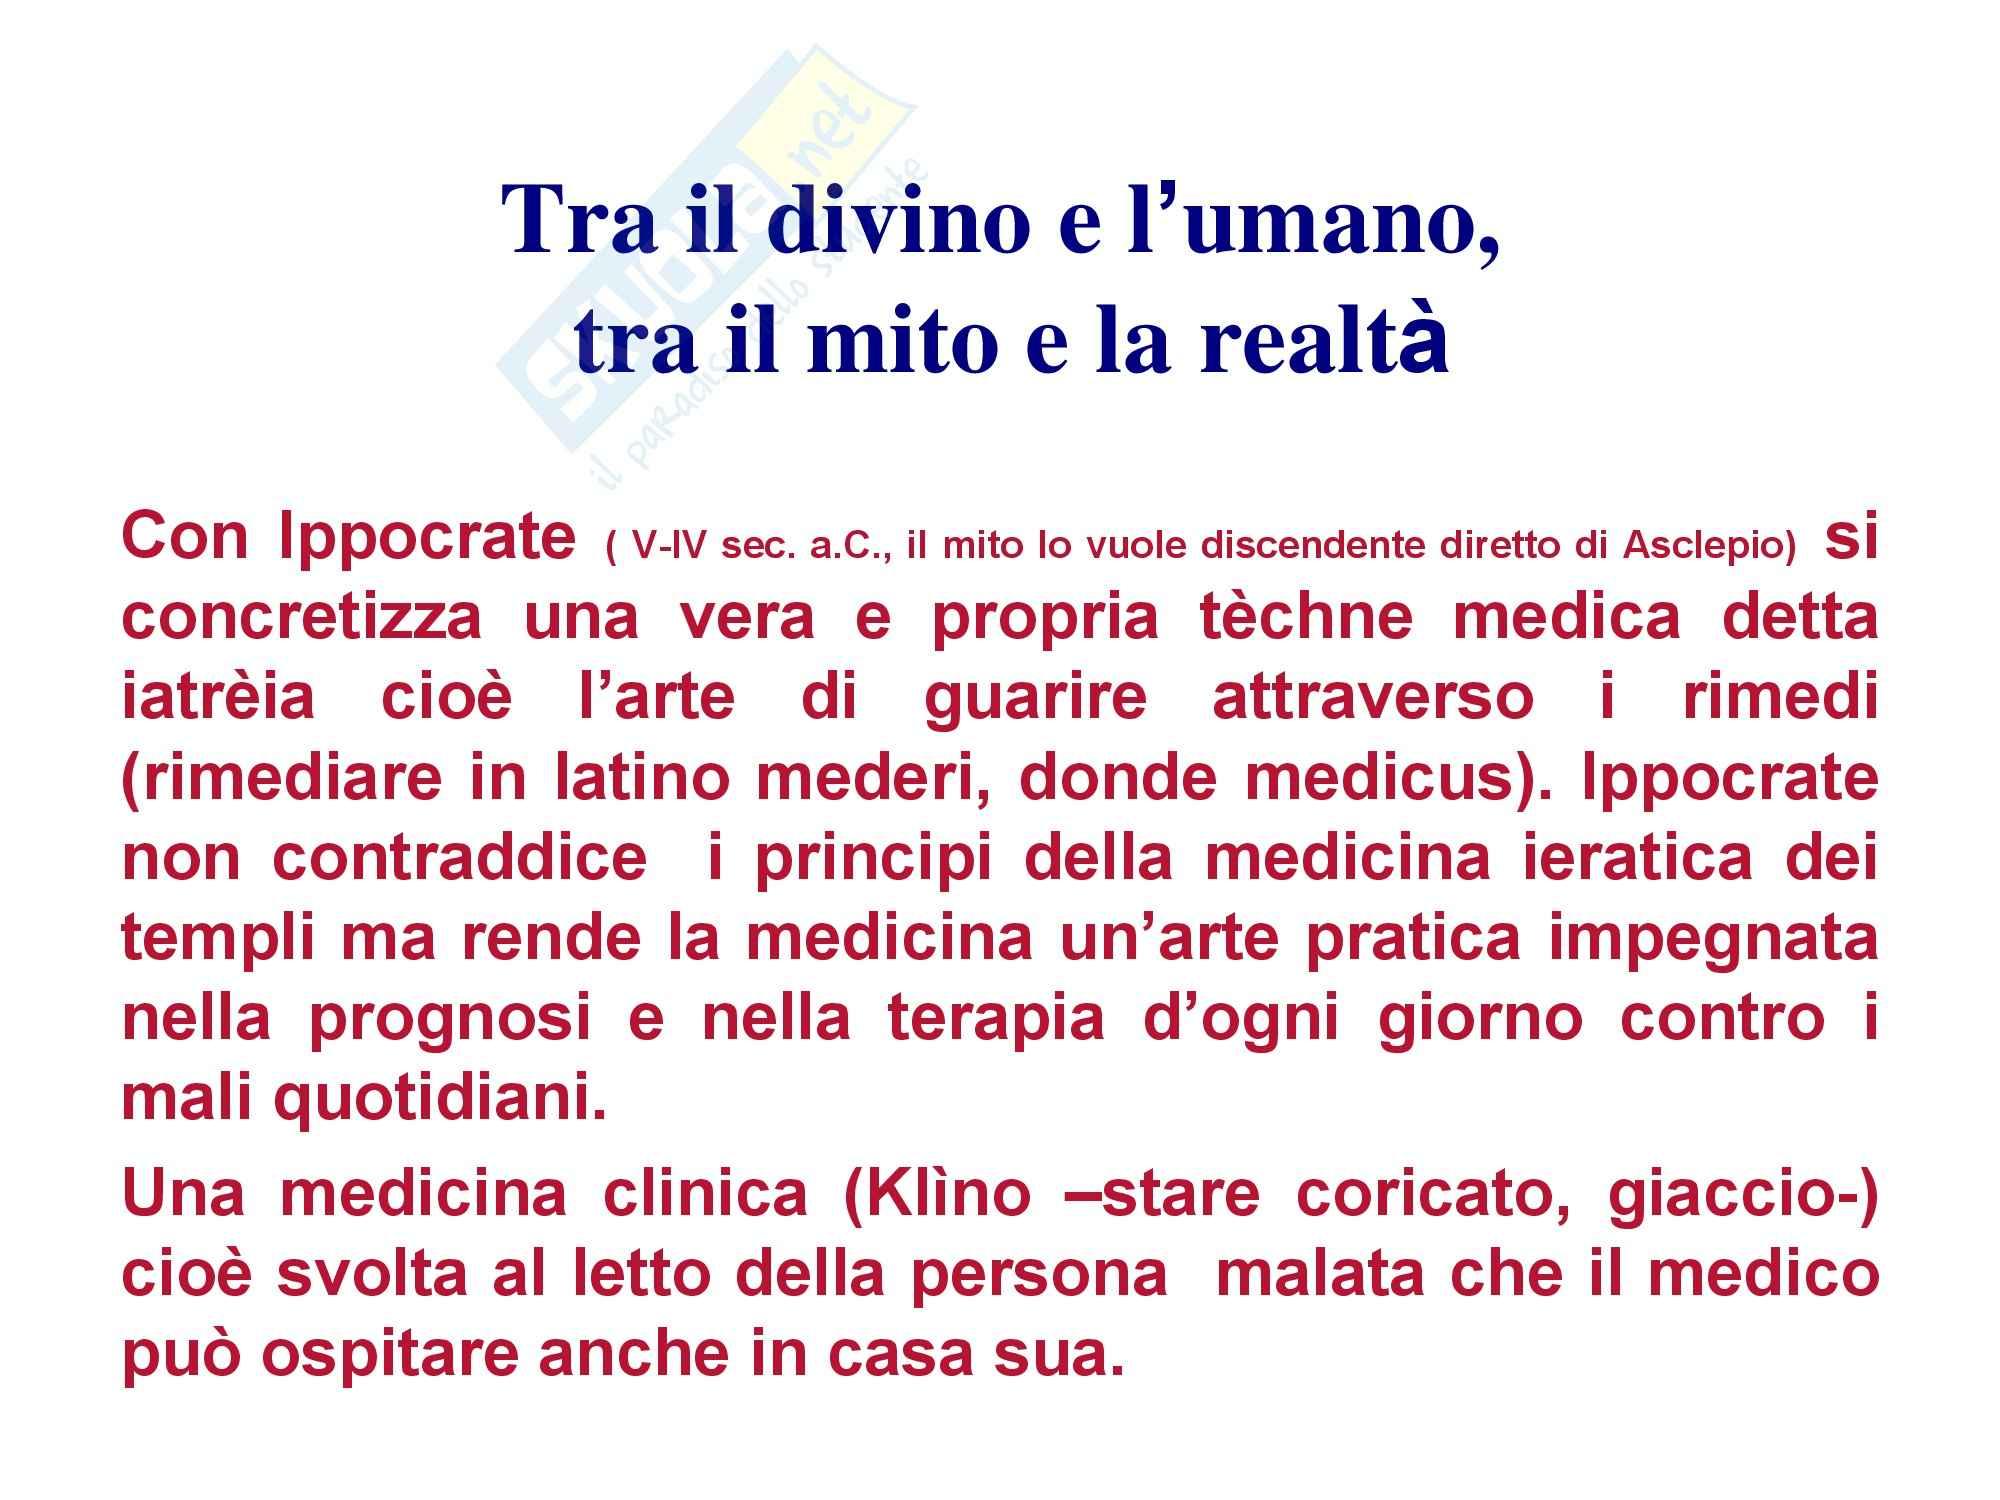 Storia della medicina - Da età classica a moderna Pag. 11